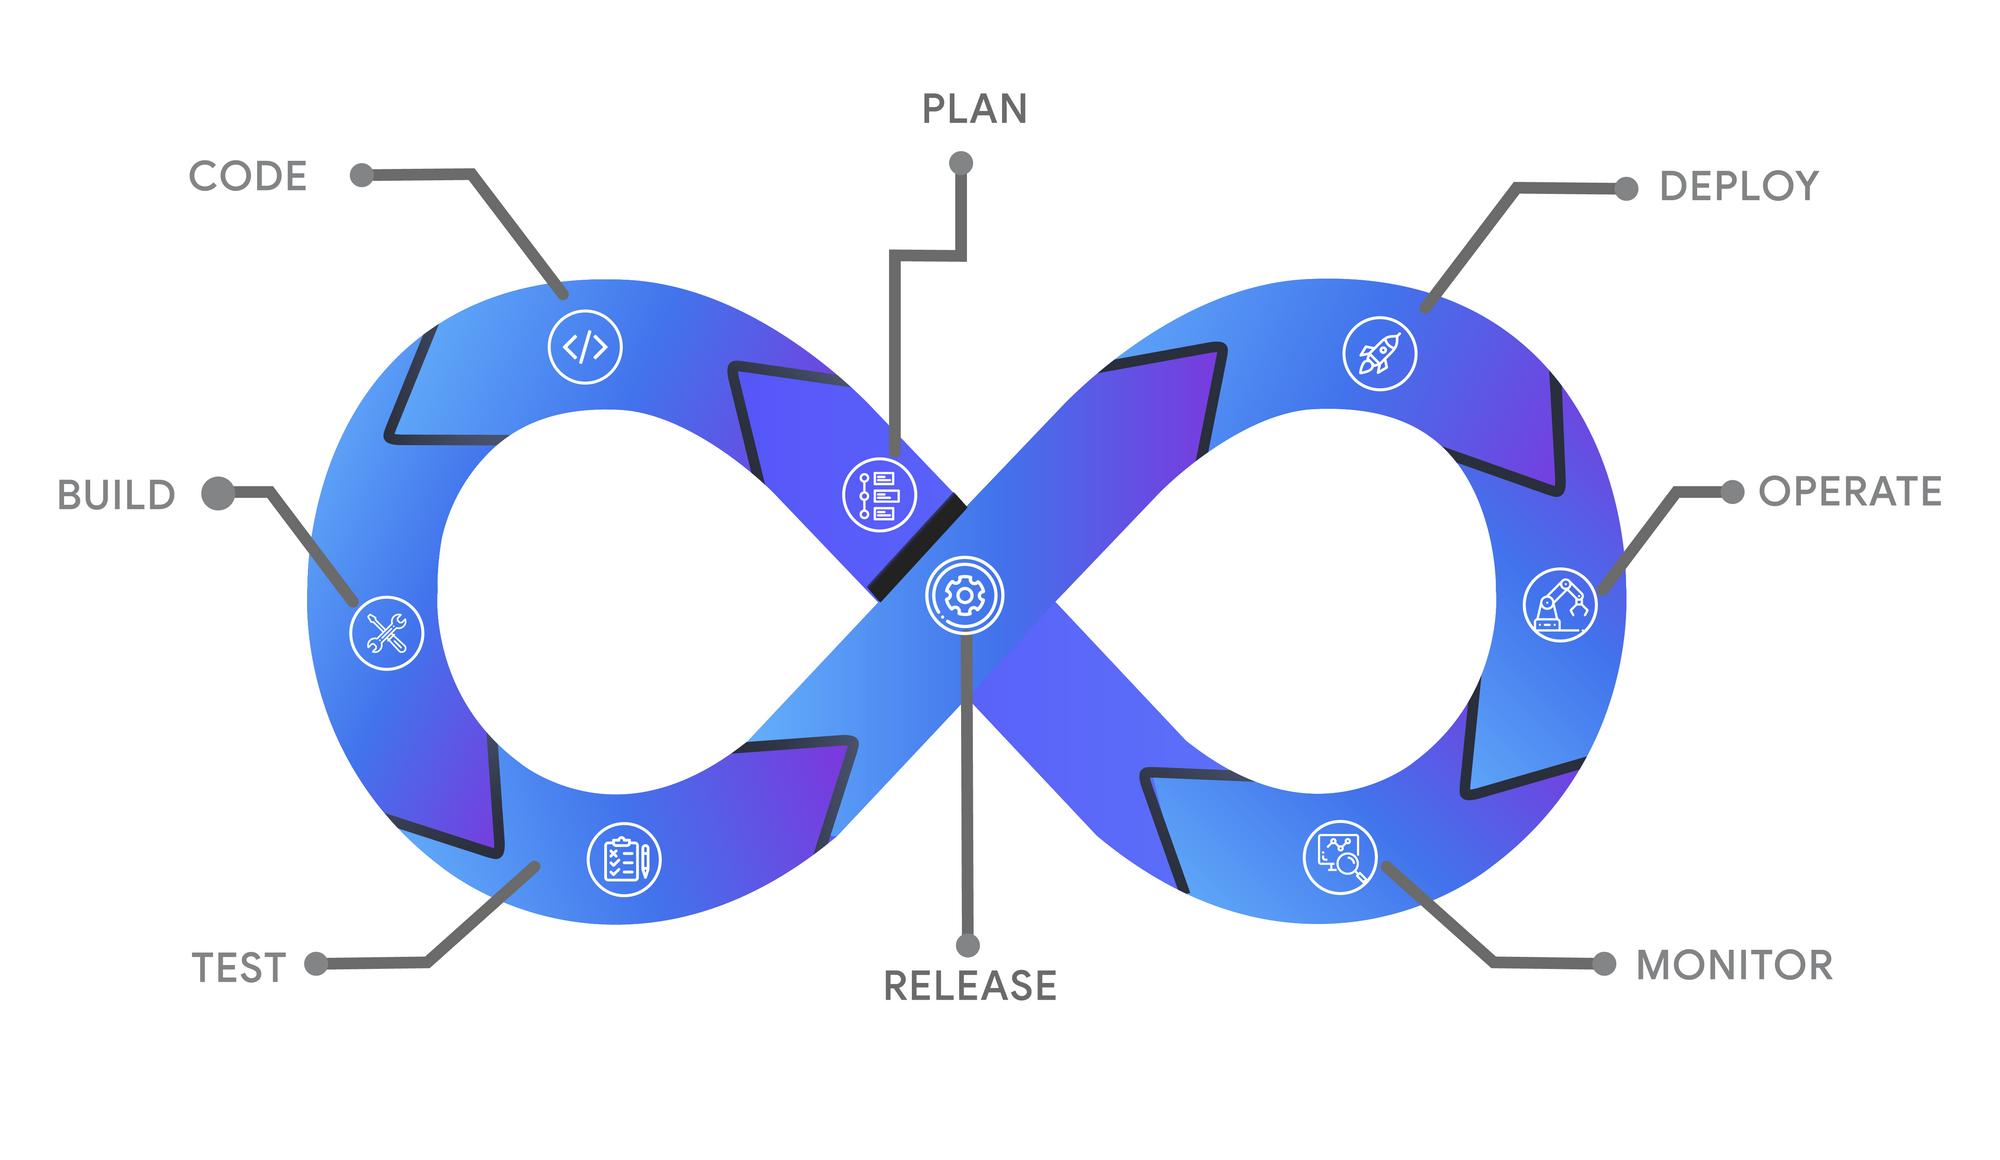 DevOps: Coding-Building-Testing-Release-Deploy-Operate-Monitor-Plan